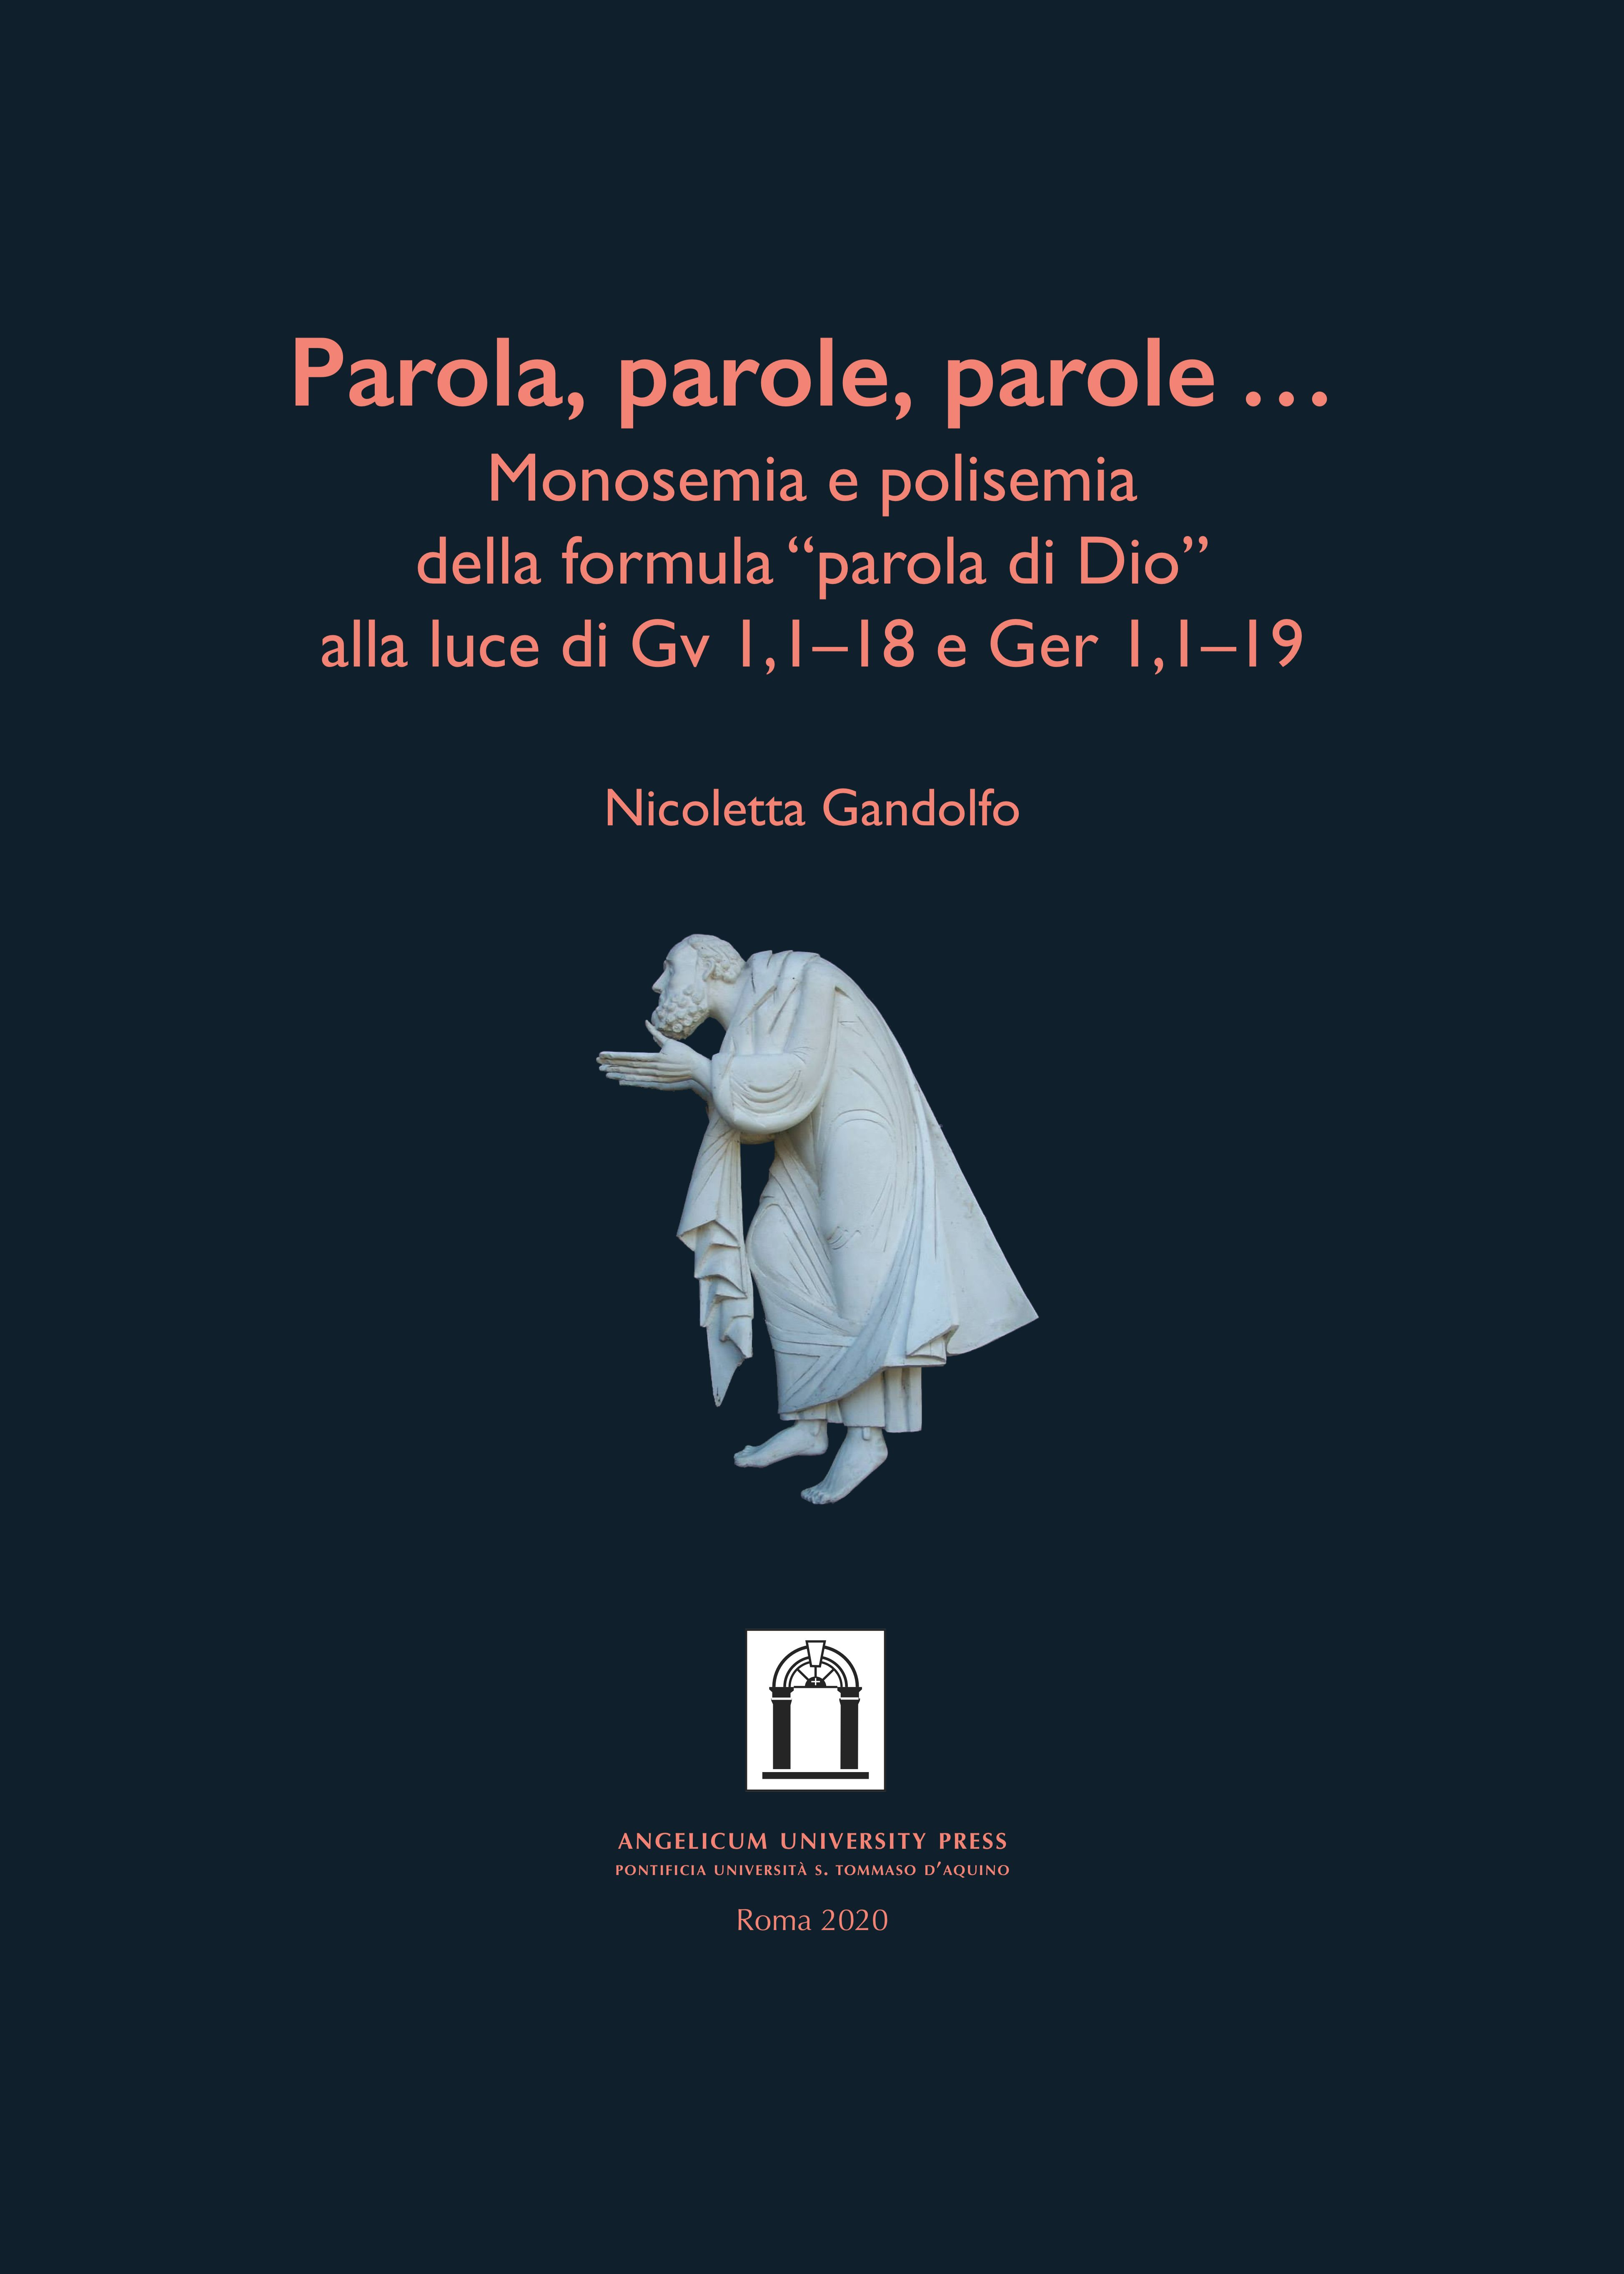 Parole, parole, parole… book cover